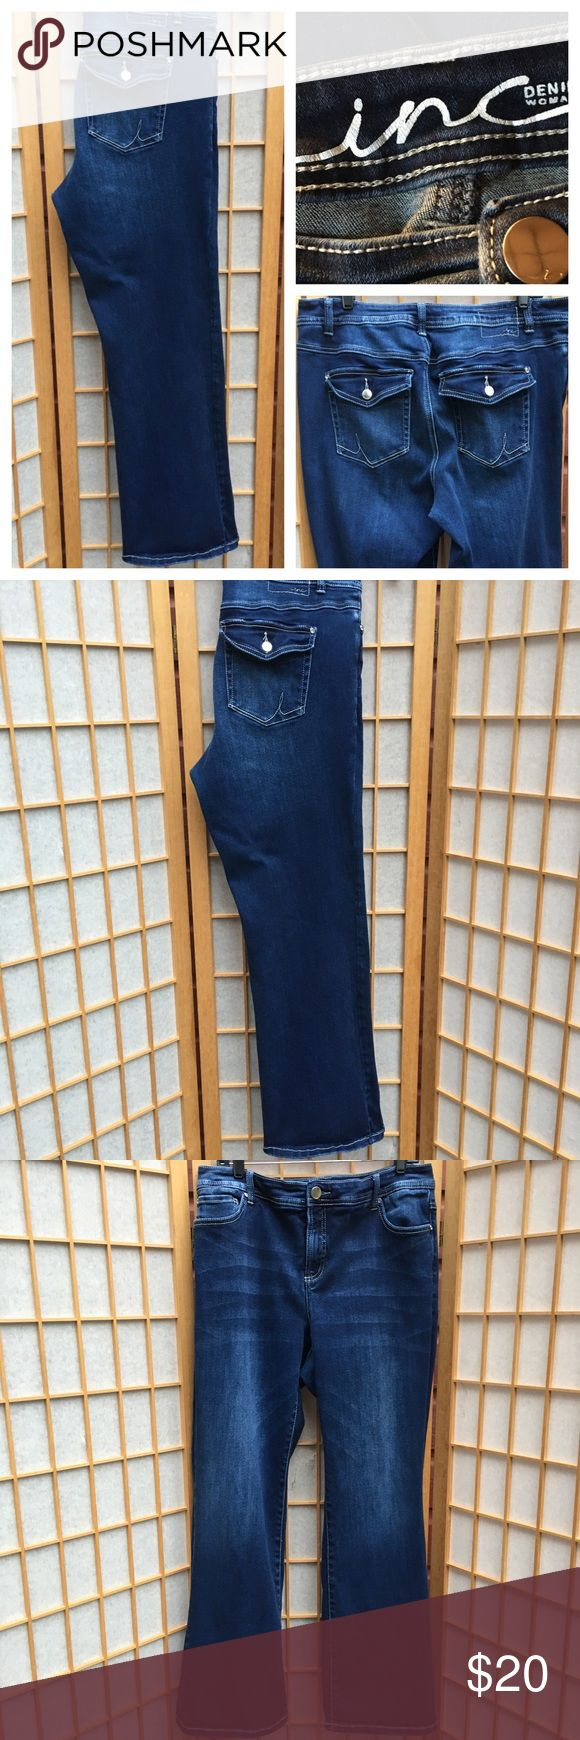 "INC Boot Cut Jeans SZ 16W Boot leg slim tech fit....back flap buttoned pockets...nice stretch....approximate measurements...waist 17 1/2"".....inseam 31 1/2""....front rise 11"".... leg opening 10""....SZ 16W INC Jeans Jeans Boot Cut"